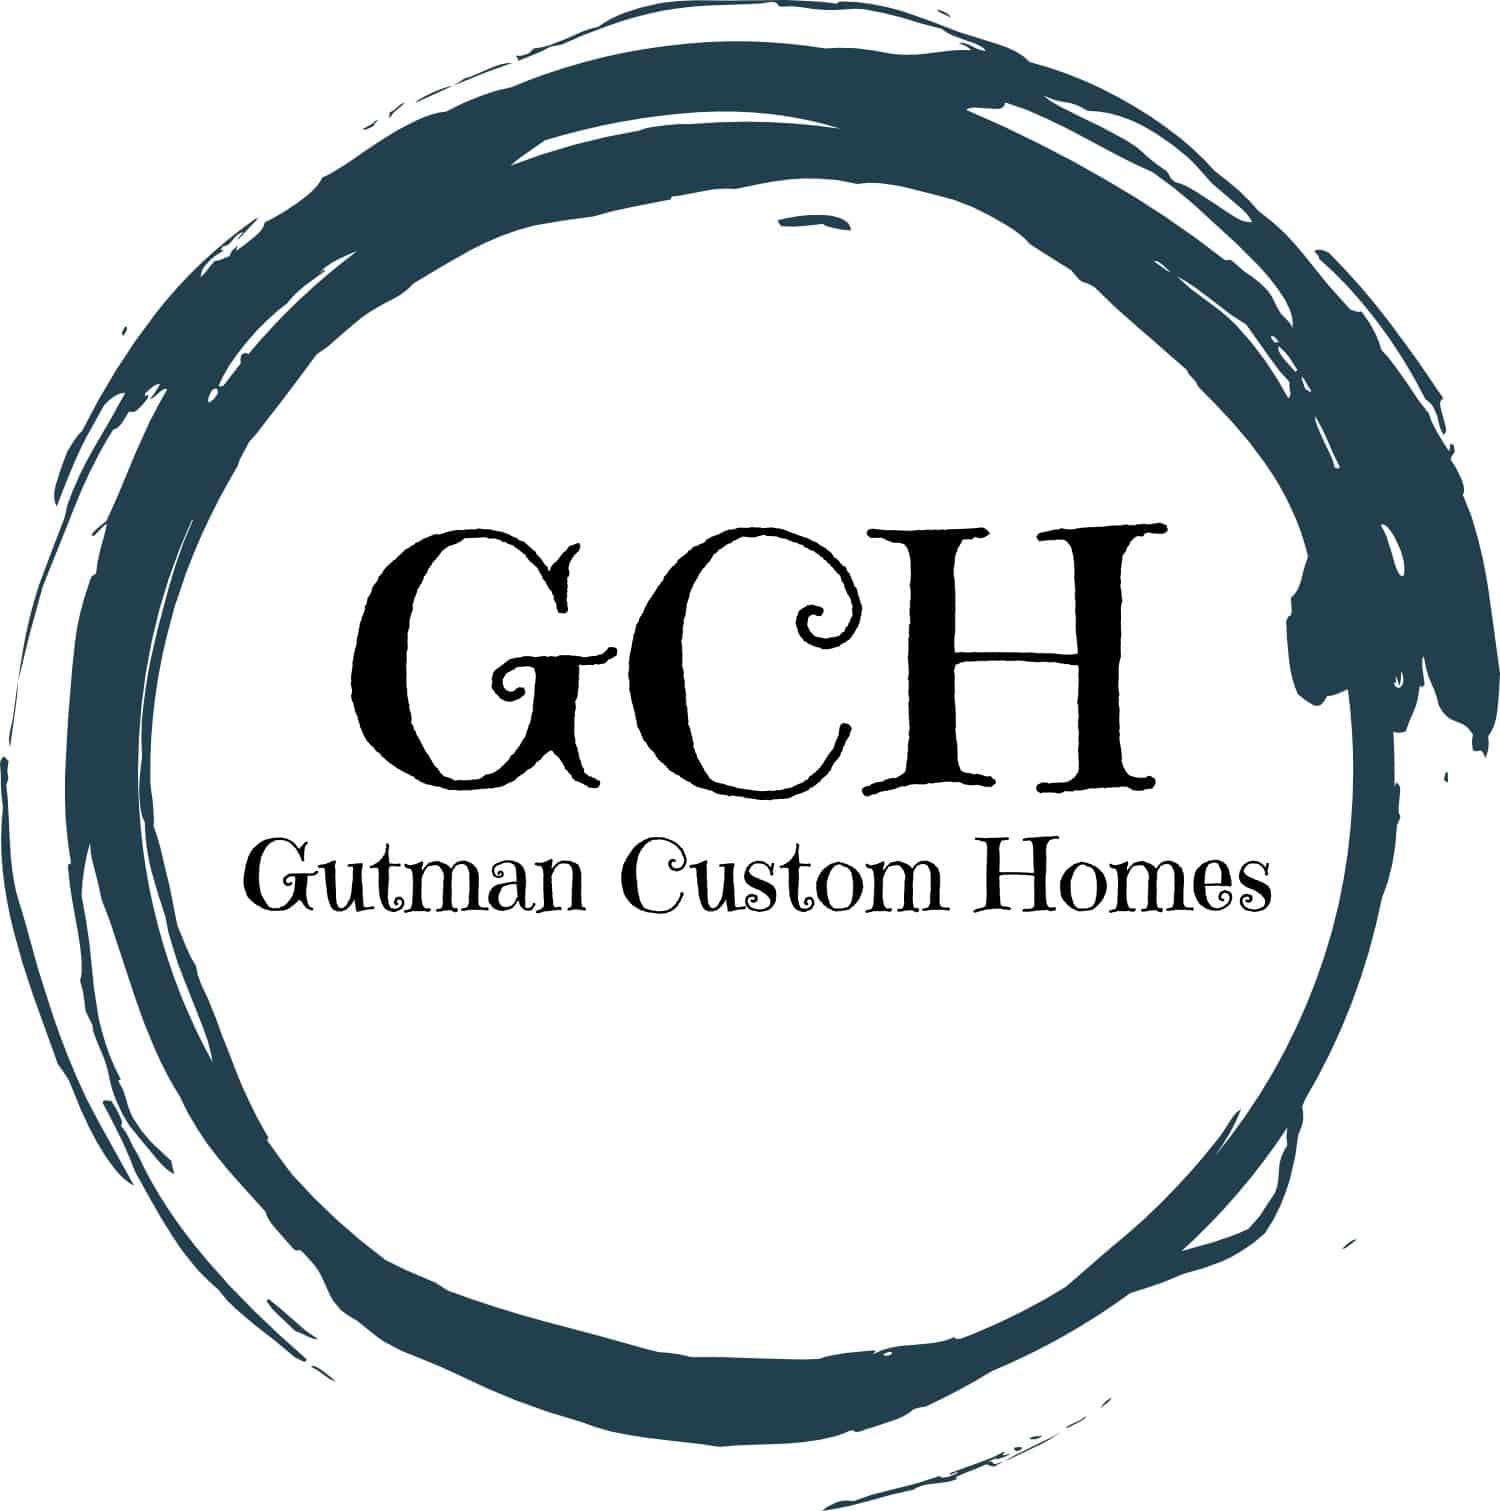 Gutman Custom Homes